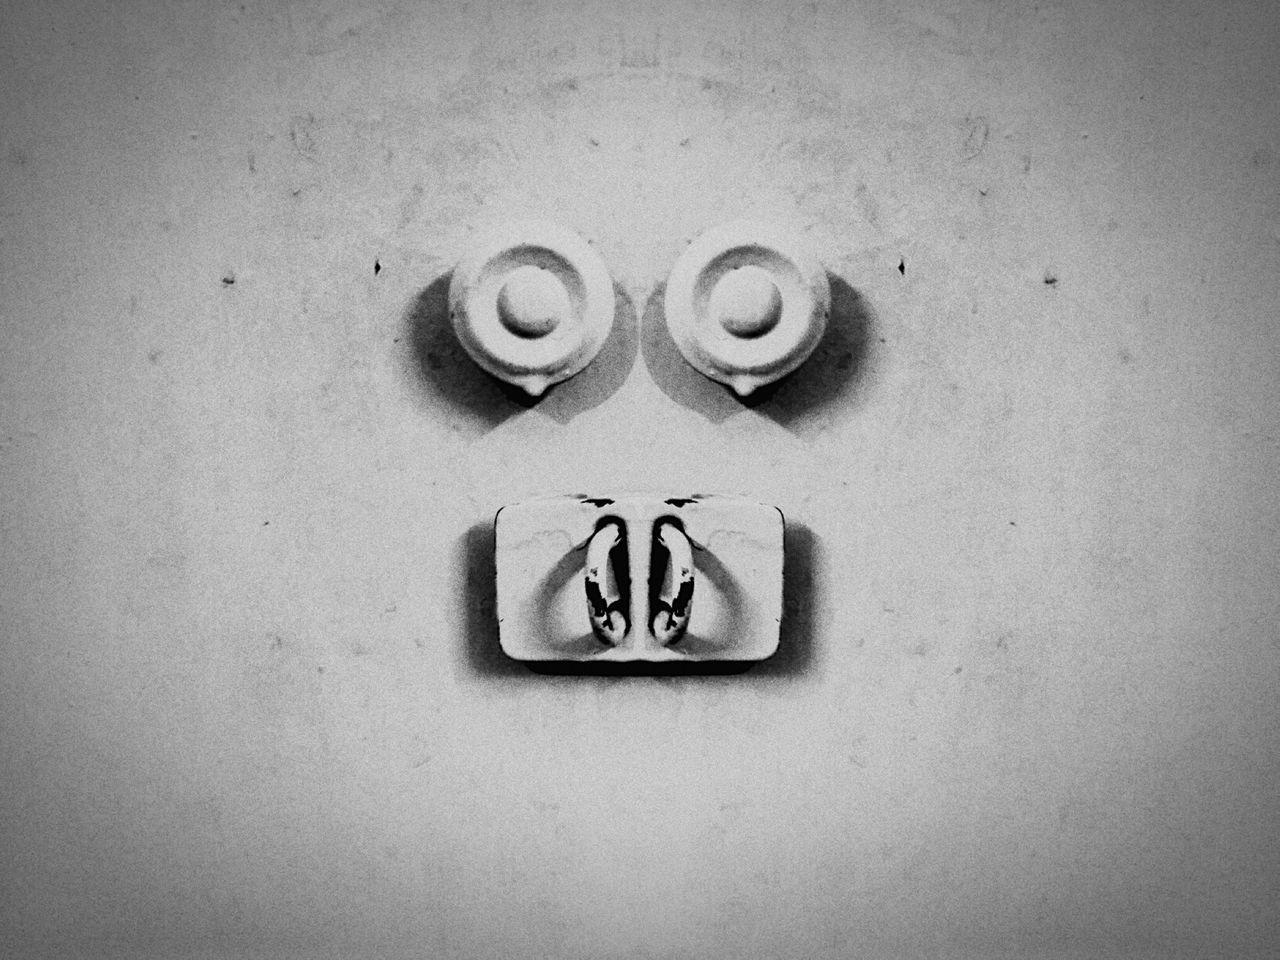 No People No Human Face Eyem Gallery Eyembestshots Home Latch Button EyeEmNewHere EyeMe Knob Face Creative Shots Knobs EyeEm Best Shots Eyes Indoor Photography Designs Popular EyEmNewHere EyeEm Gallery Close-up Illusion Confusion. The City Light